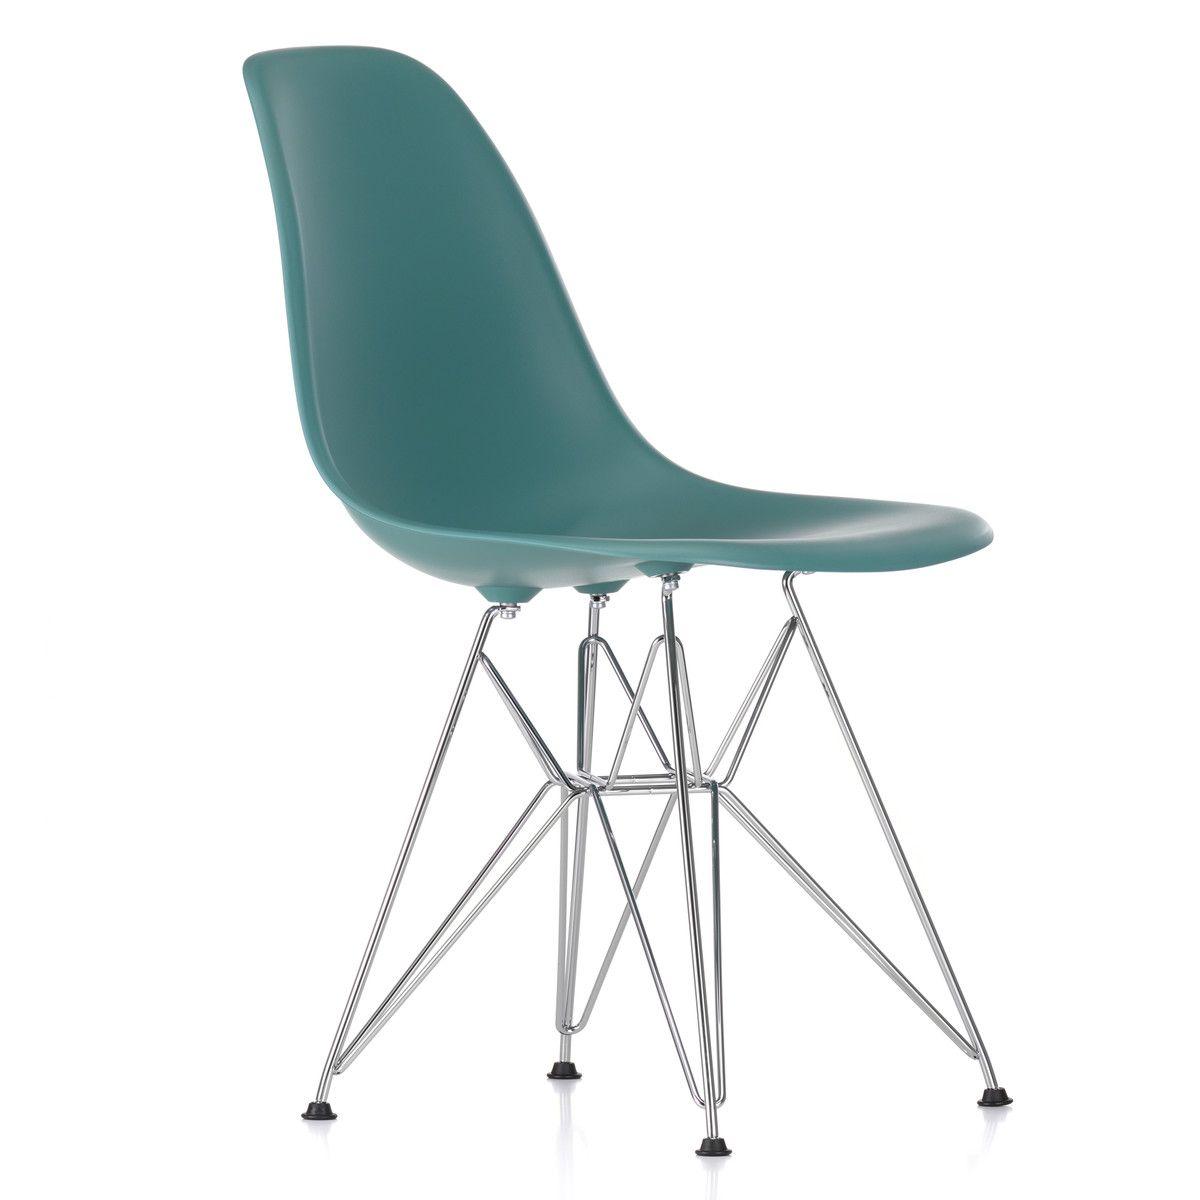 Vitra Eames Plastic Side Chair Dsr Verchromt Basalt Kunststoffgleiter Basic Dark Eames Stuhle Esszimmerstuhle